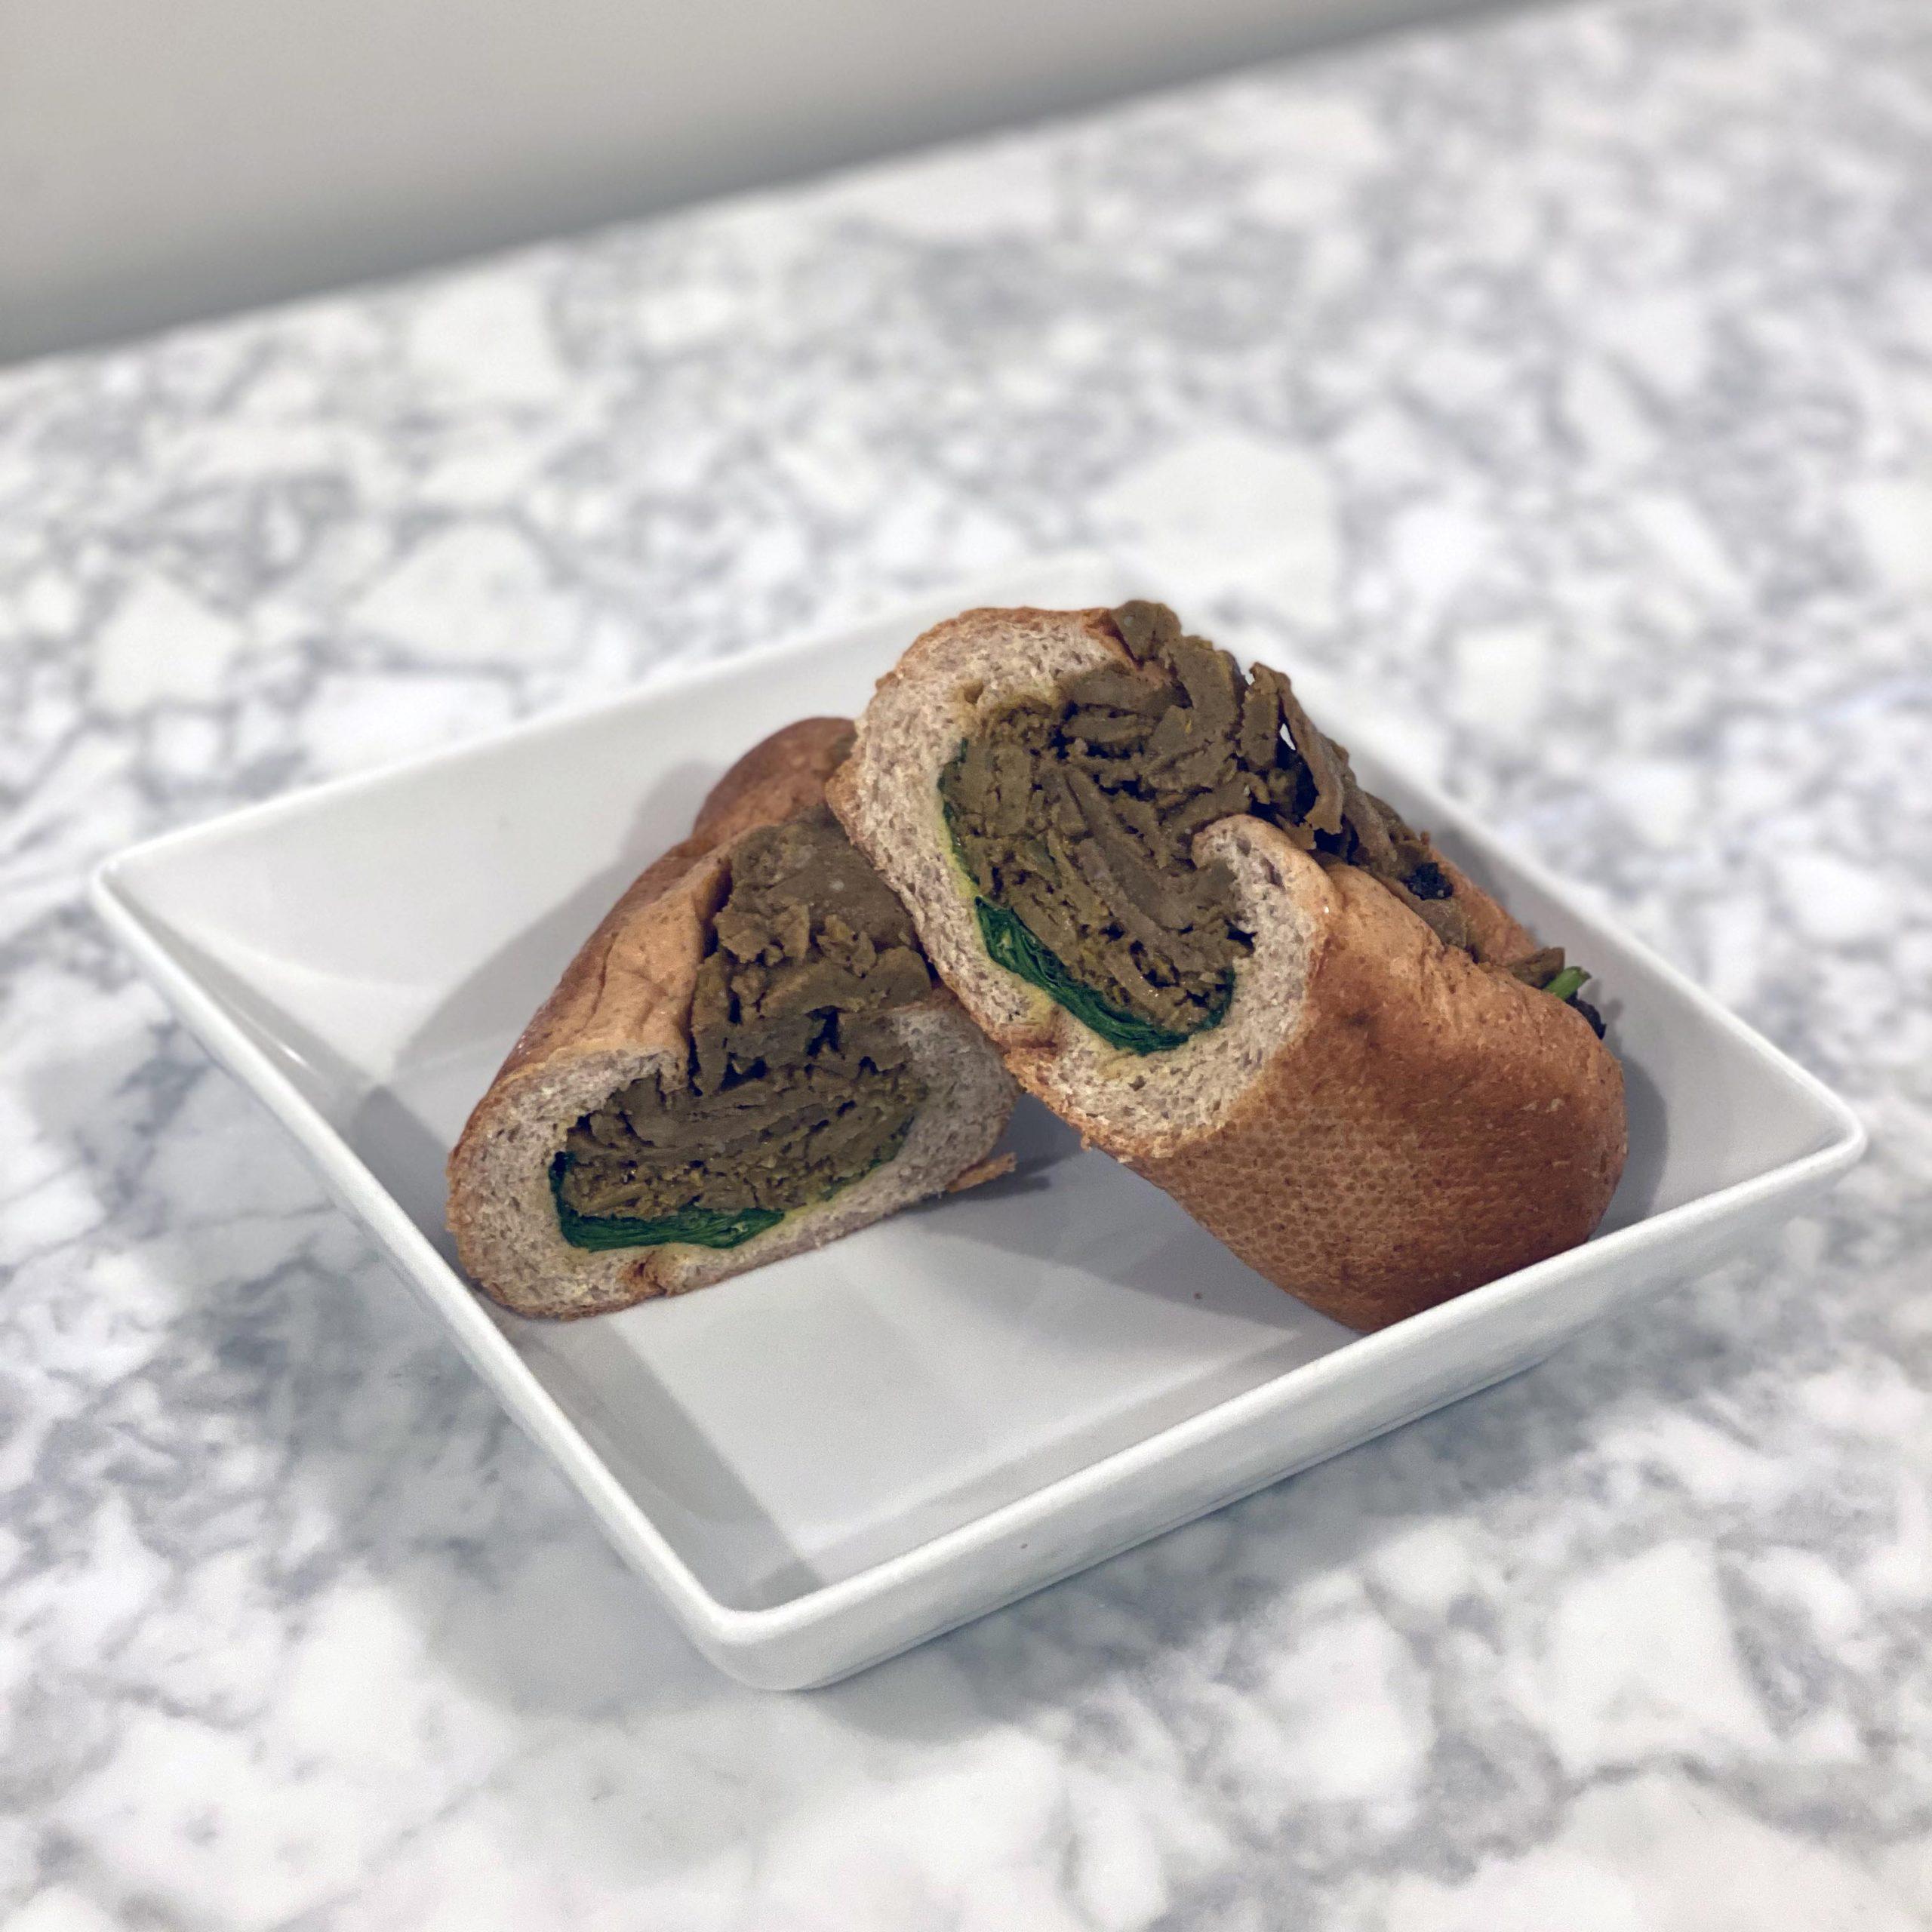 Shawarma Sub Plated Side